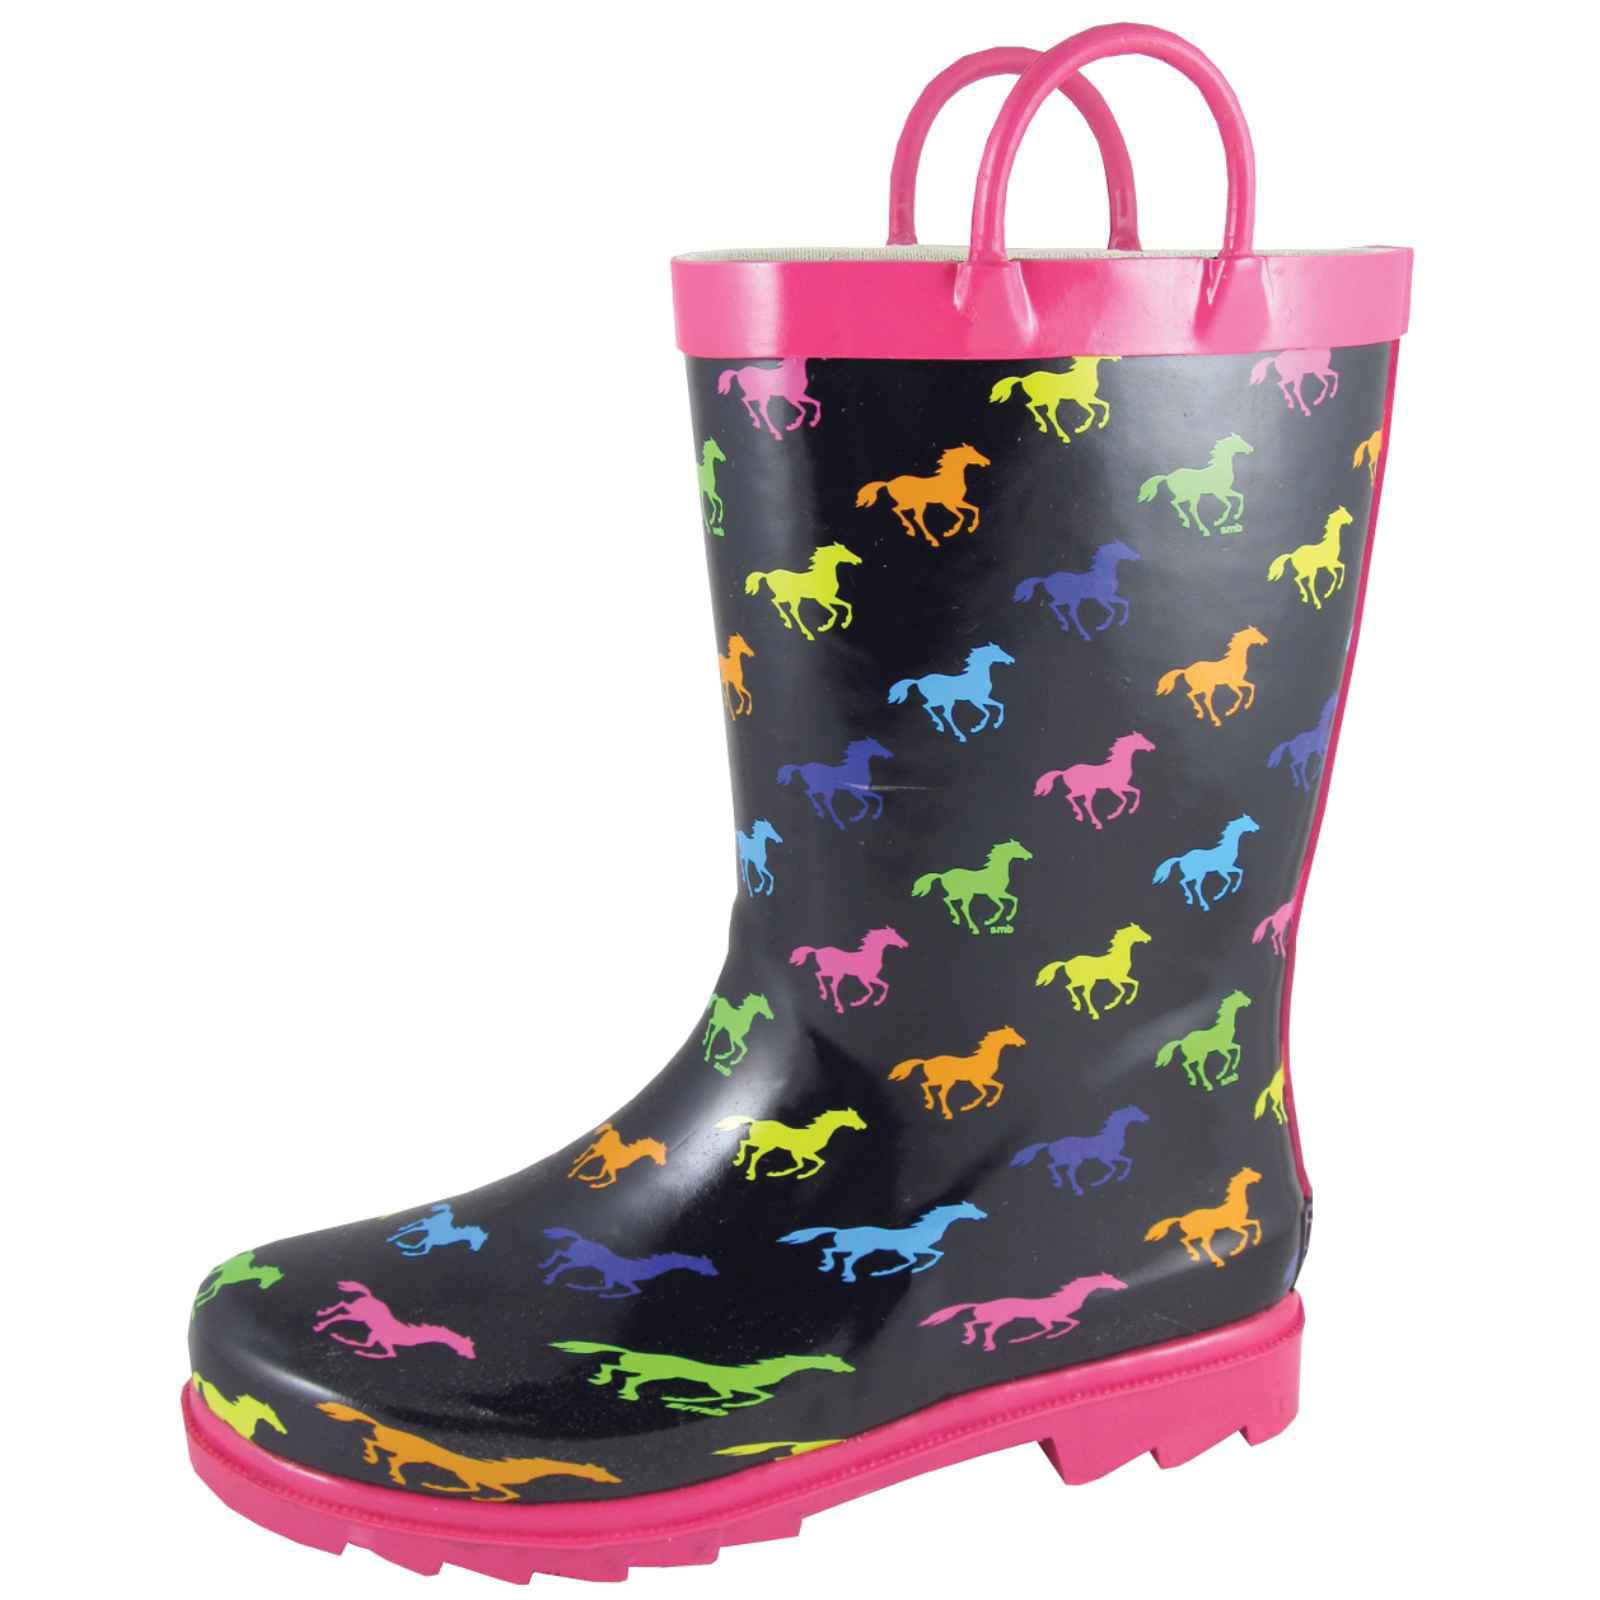 Smoky Mountain Boots - Smoky Mountain Girl's Ponies Black/Multi Rubber  Boots 2754 - Walmart.com - Walmart.com